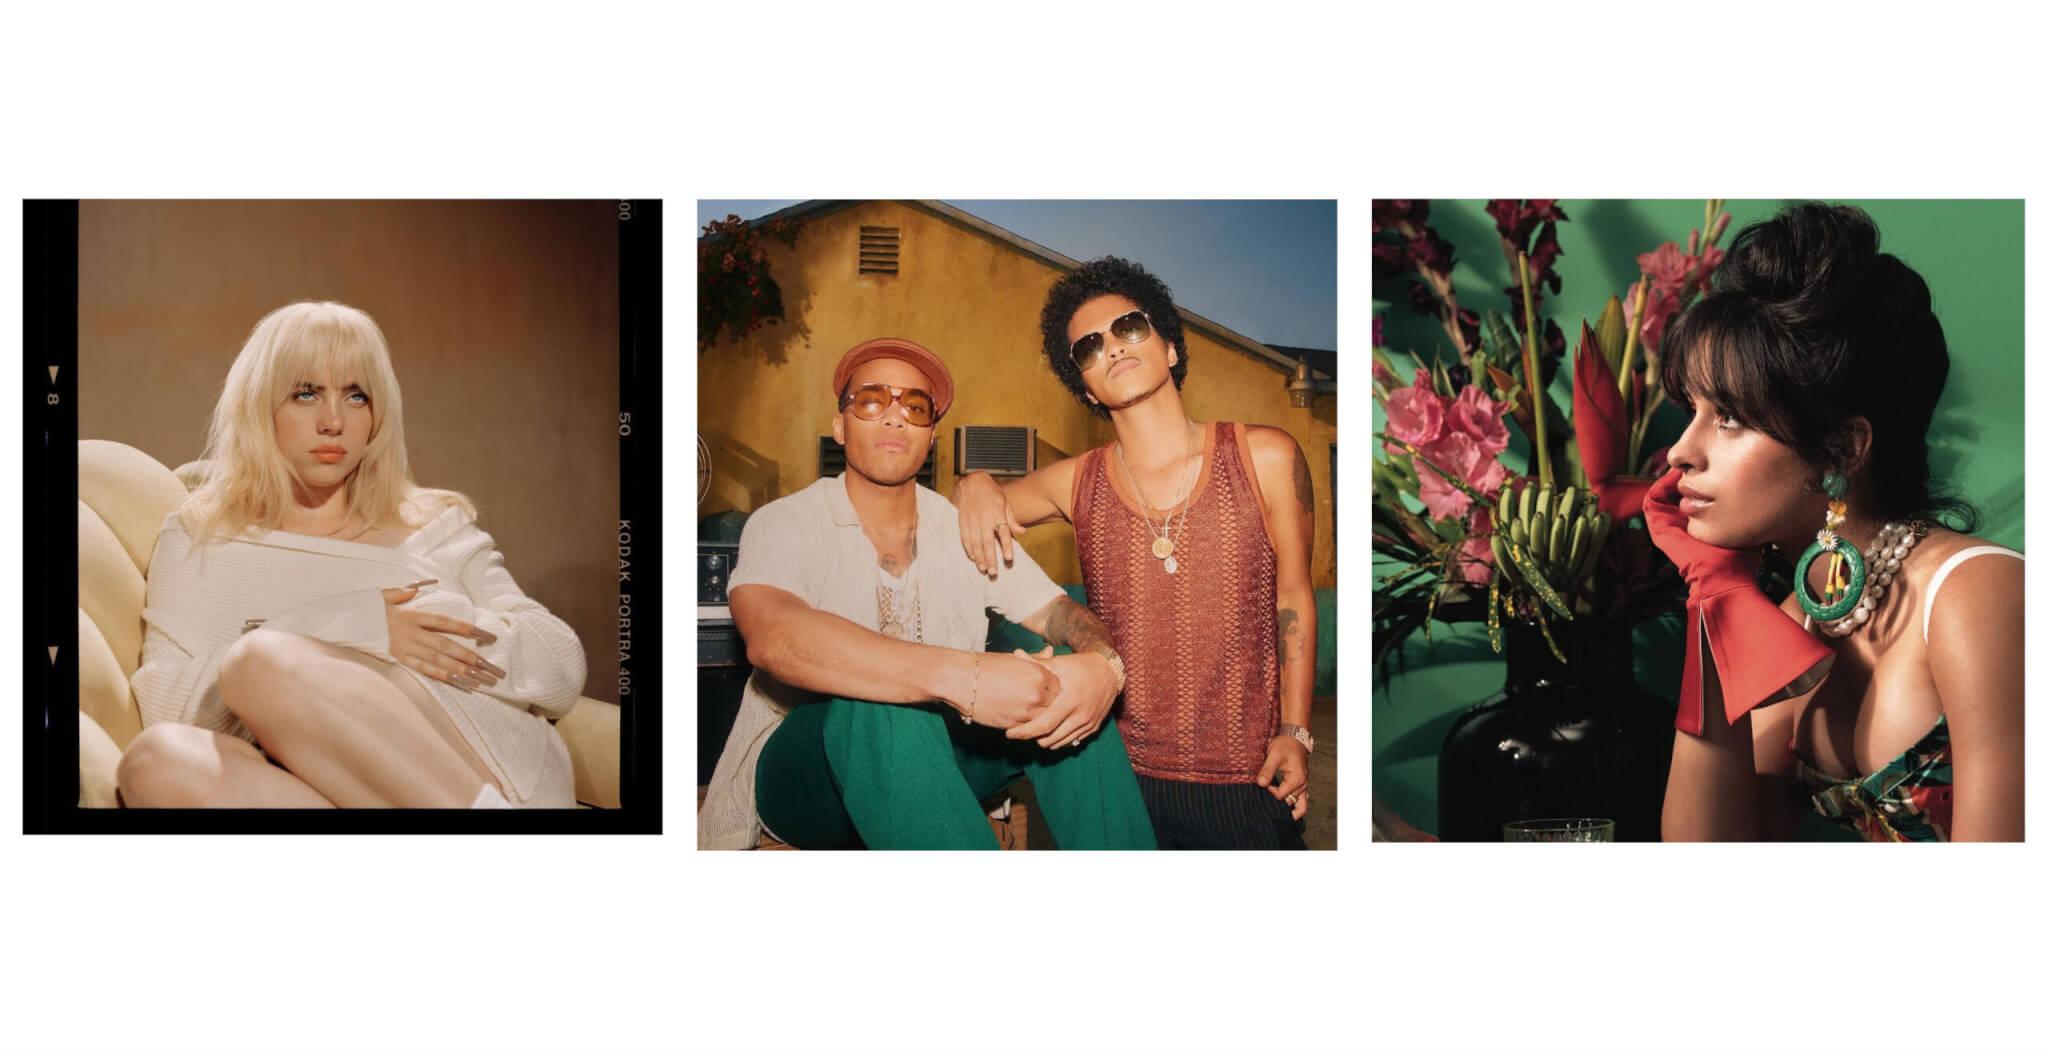 Billie Eilish, Silk Sonic, Anderson Paak, Camilla Cabello, Music Video Releases